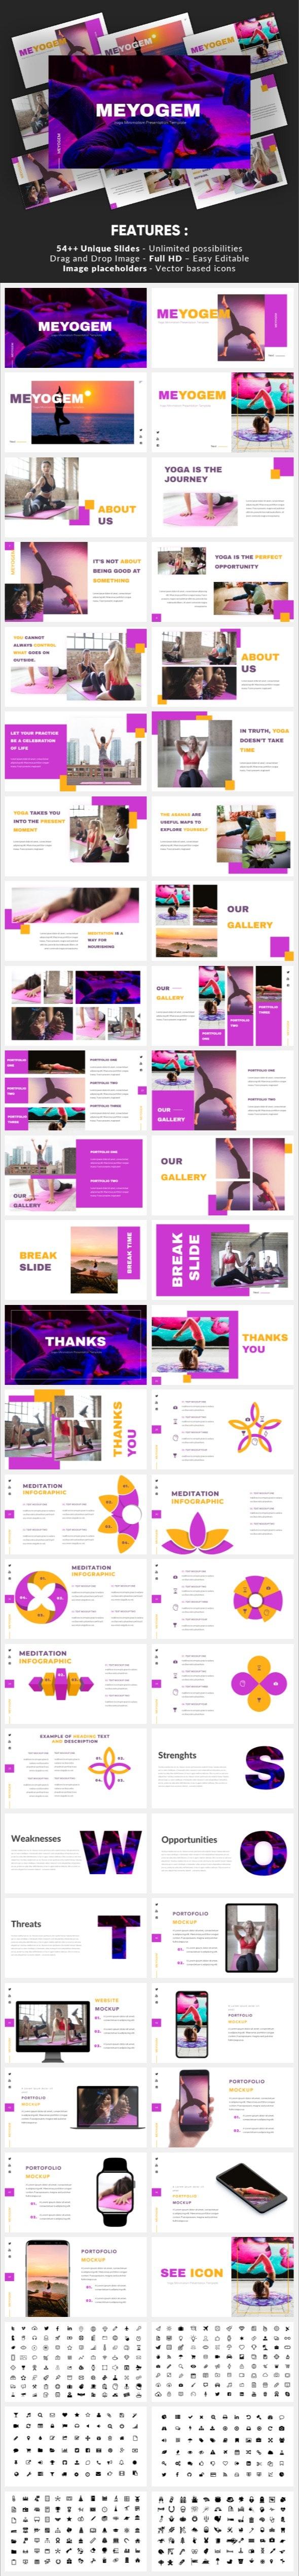 Meyogem - Yoga Minimalism Keynote Template - Business Keynote Templates